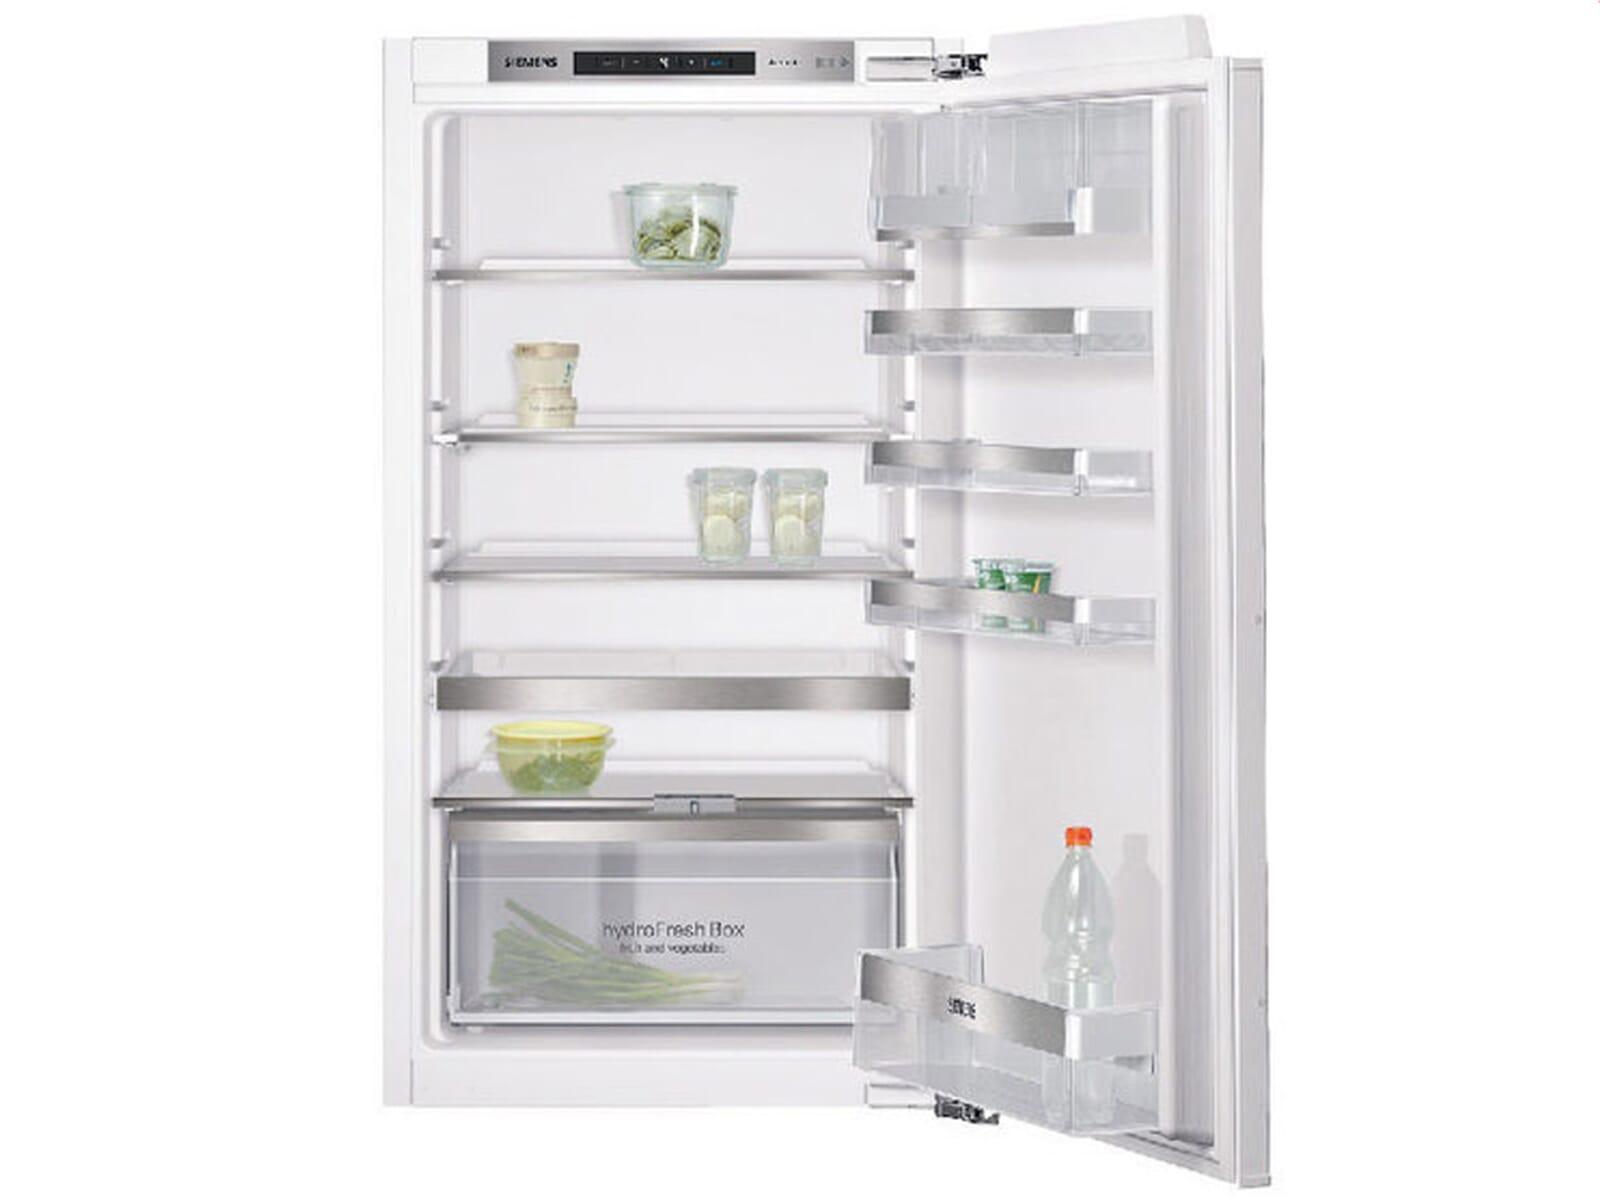 Siemens KI31RAD40 Einbaukühlschrank Kühlgerät Kühlschrank